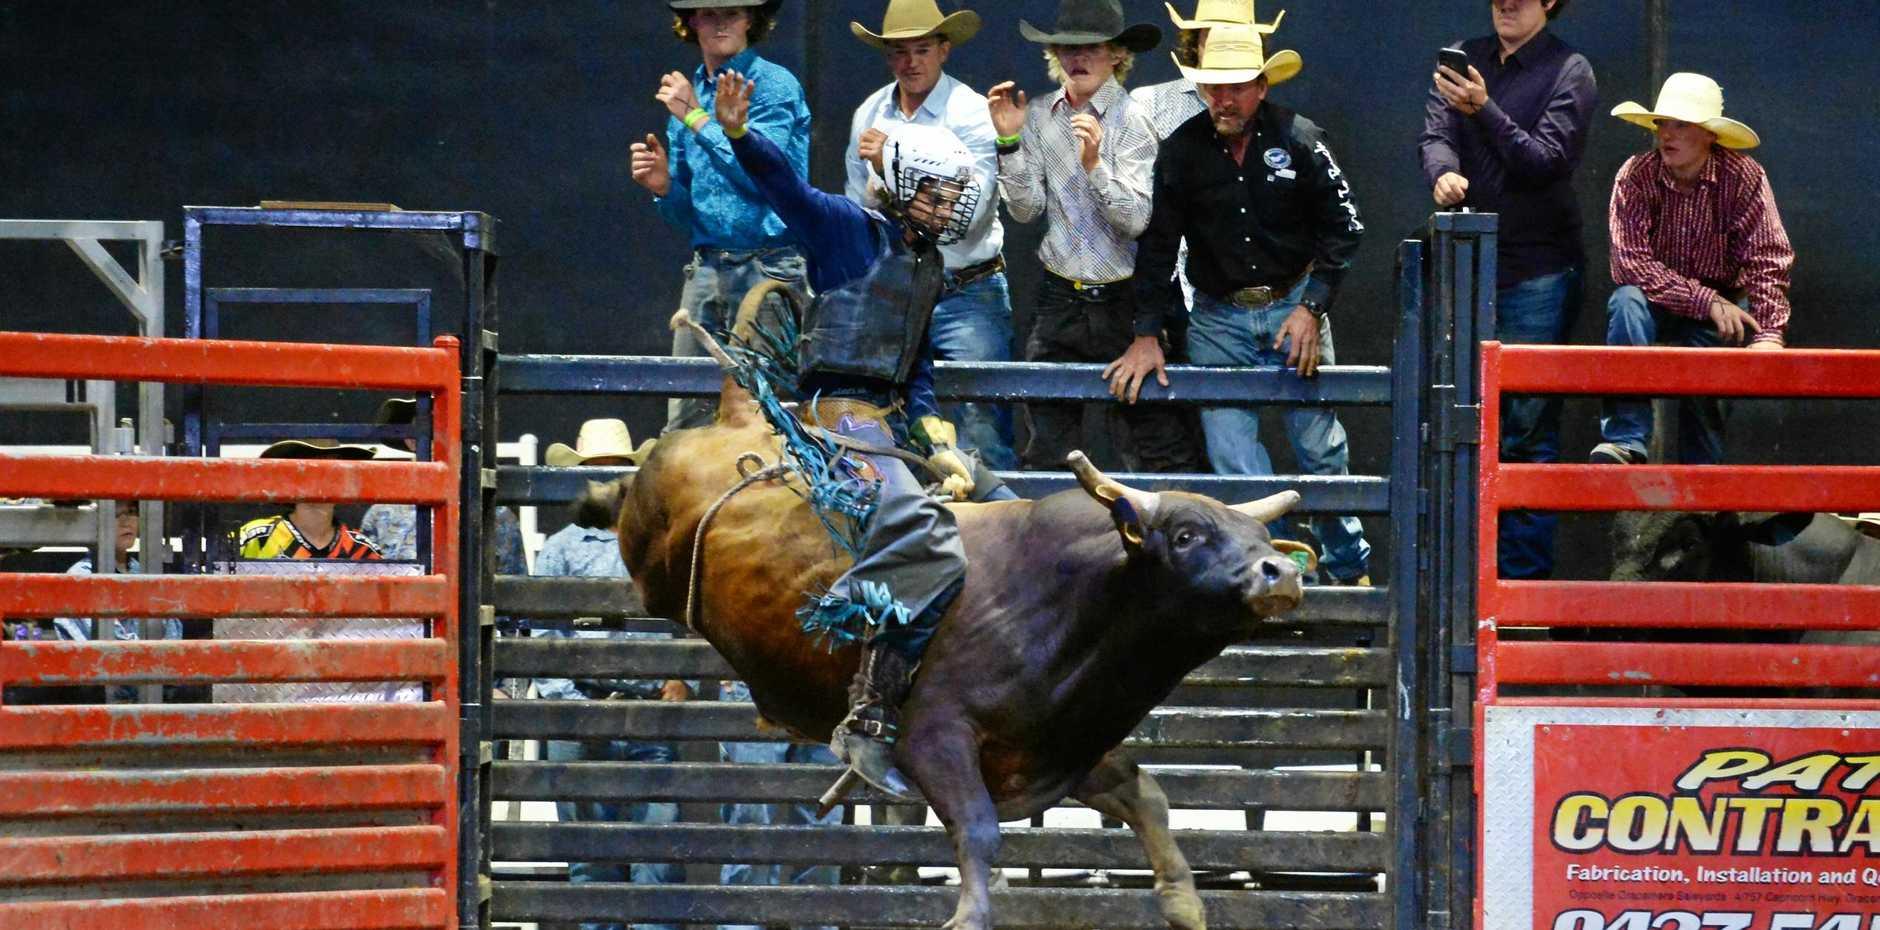 SADDLE UP: Top Guns u18 bull ride winner Macaulie Leather.